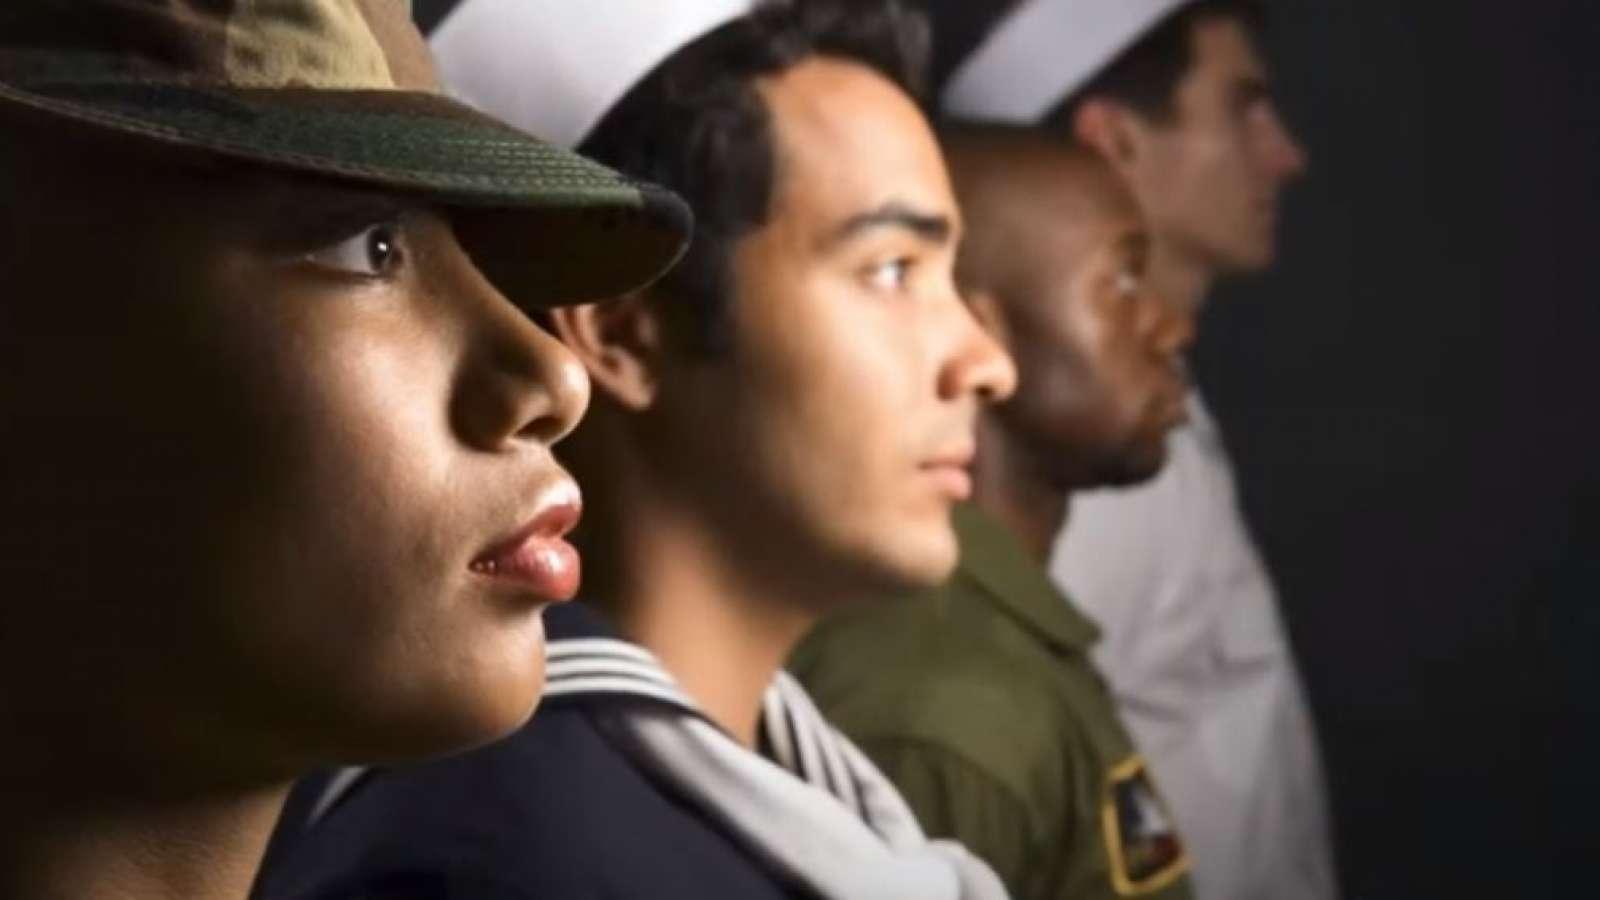 profiles of various service members